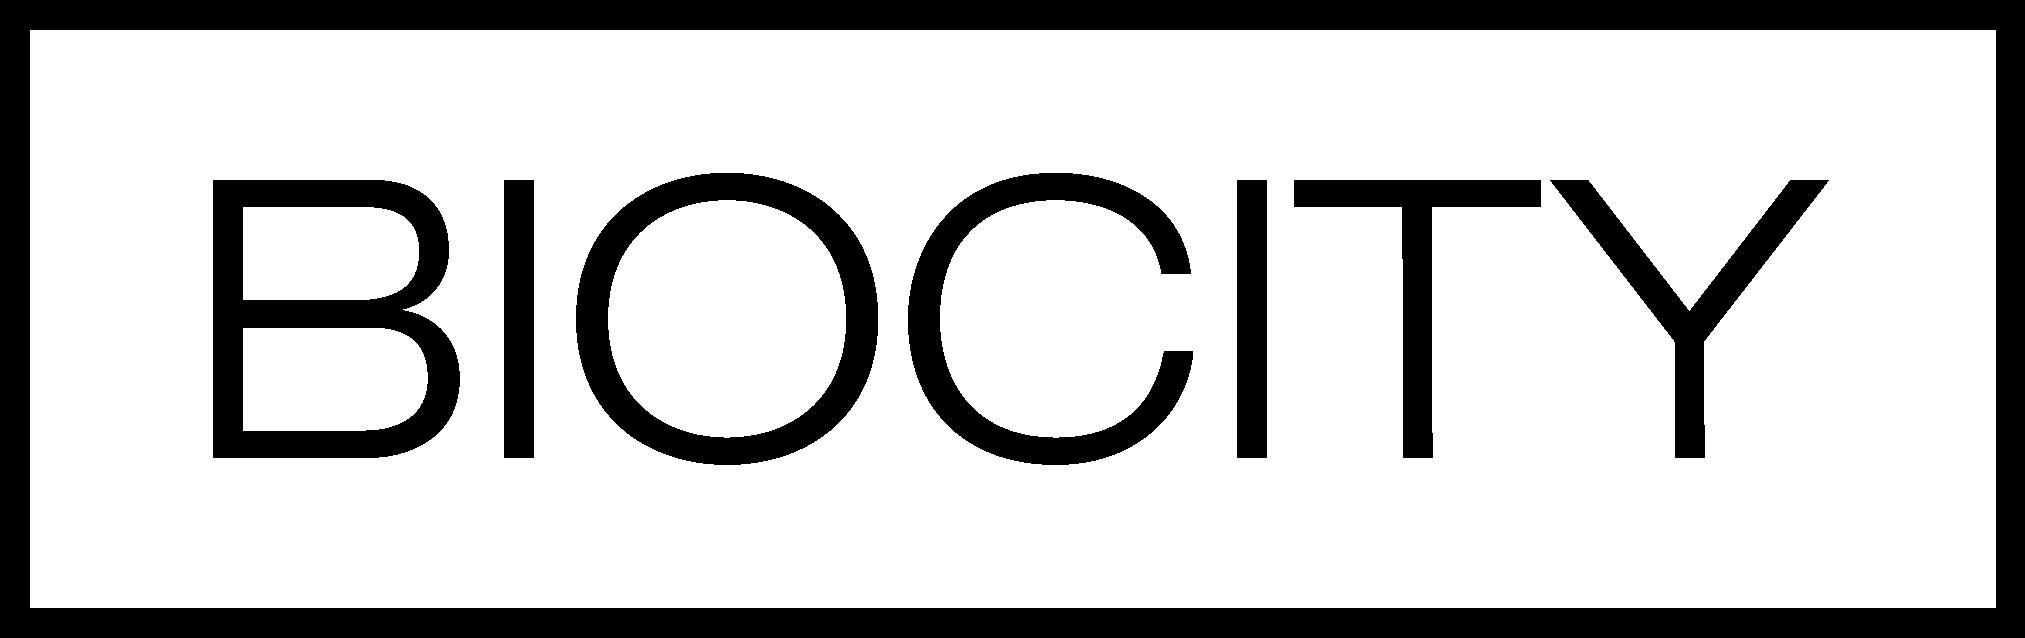 Biocity logo